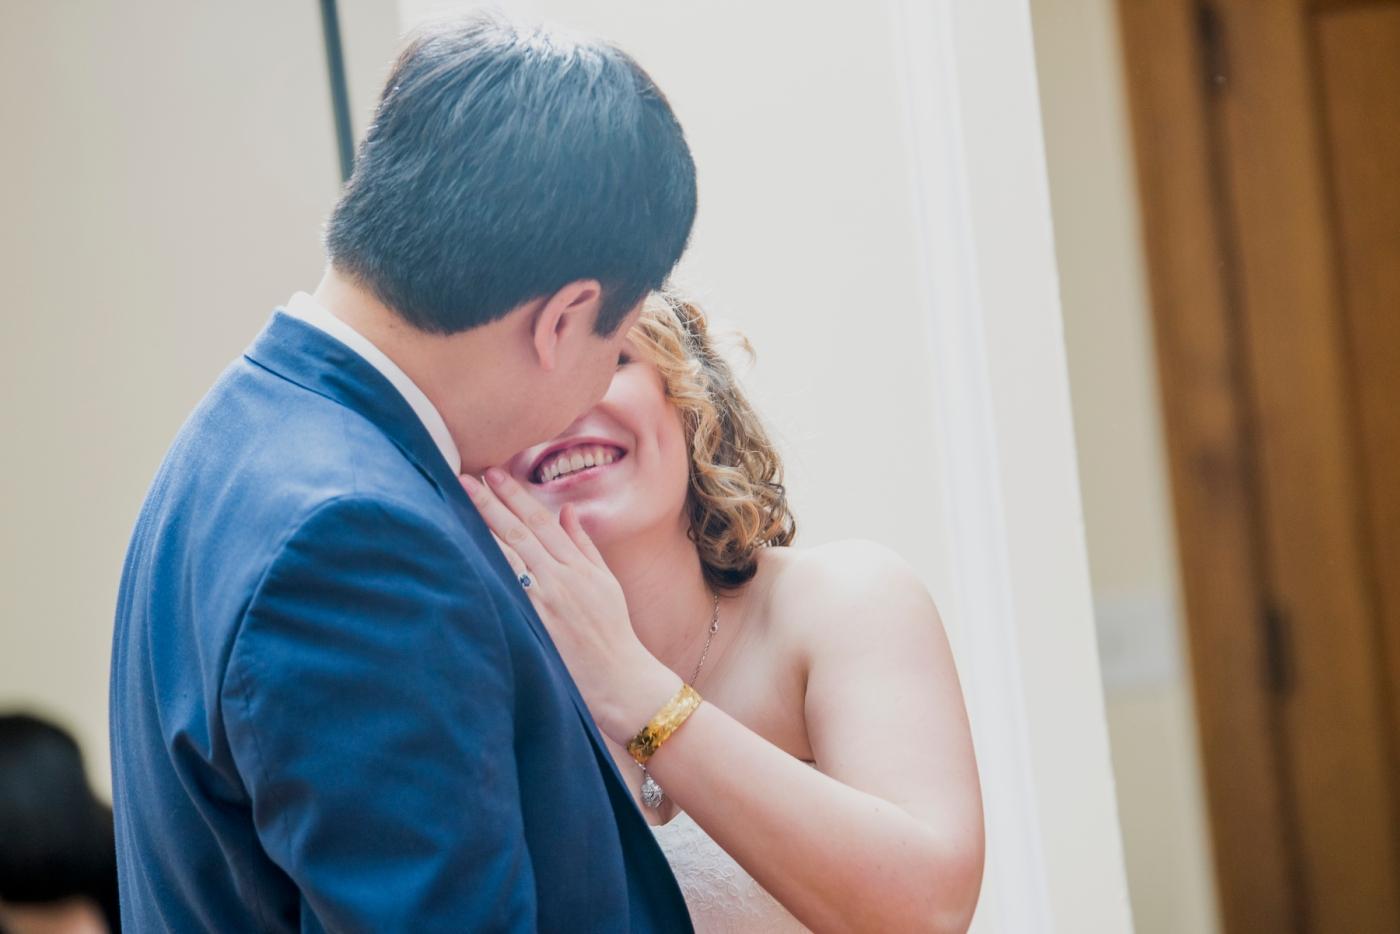 DSC_3220Everett_Wedding_Ballroom_Jane_Speleers_photography_Rachel_and_Edmund_reception_2017